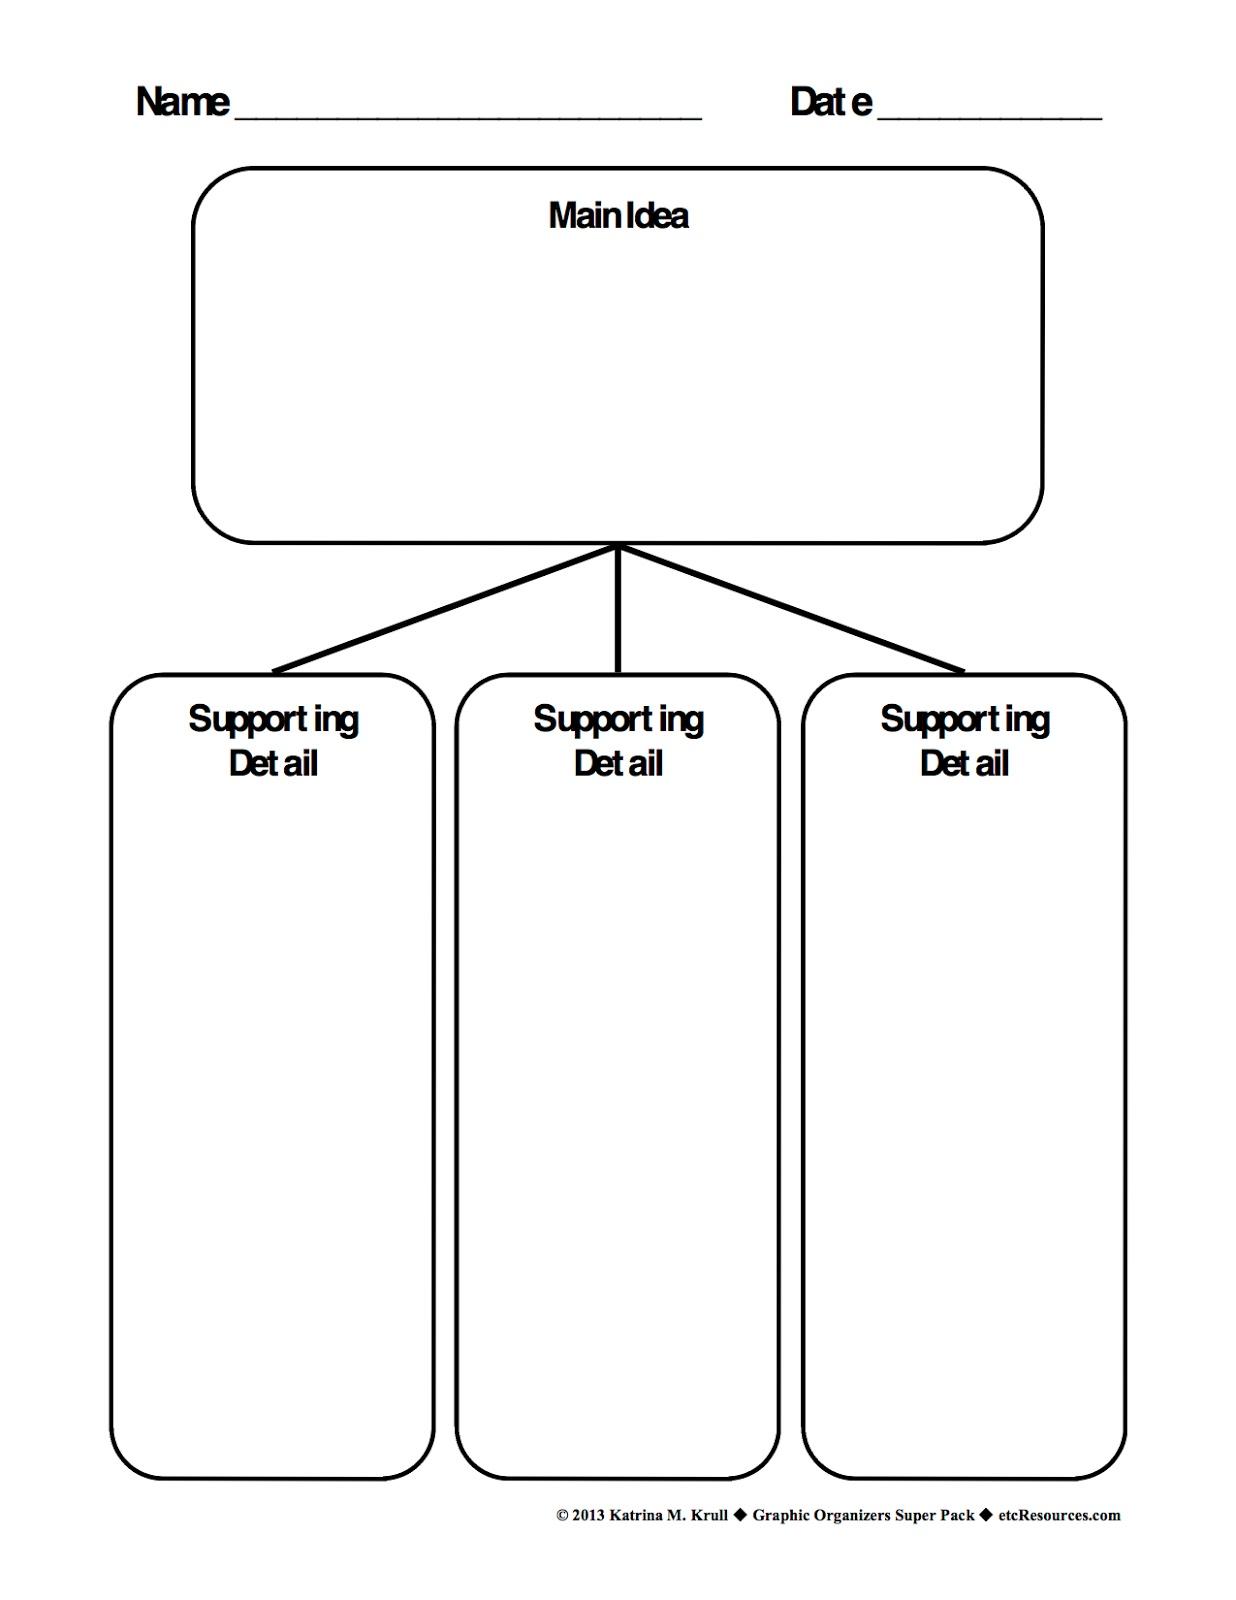 Ms Bakamis 3rd Grade Class Main Ideas Amp Supportive Details